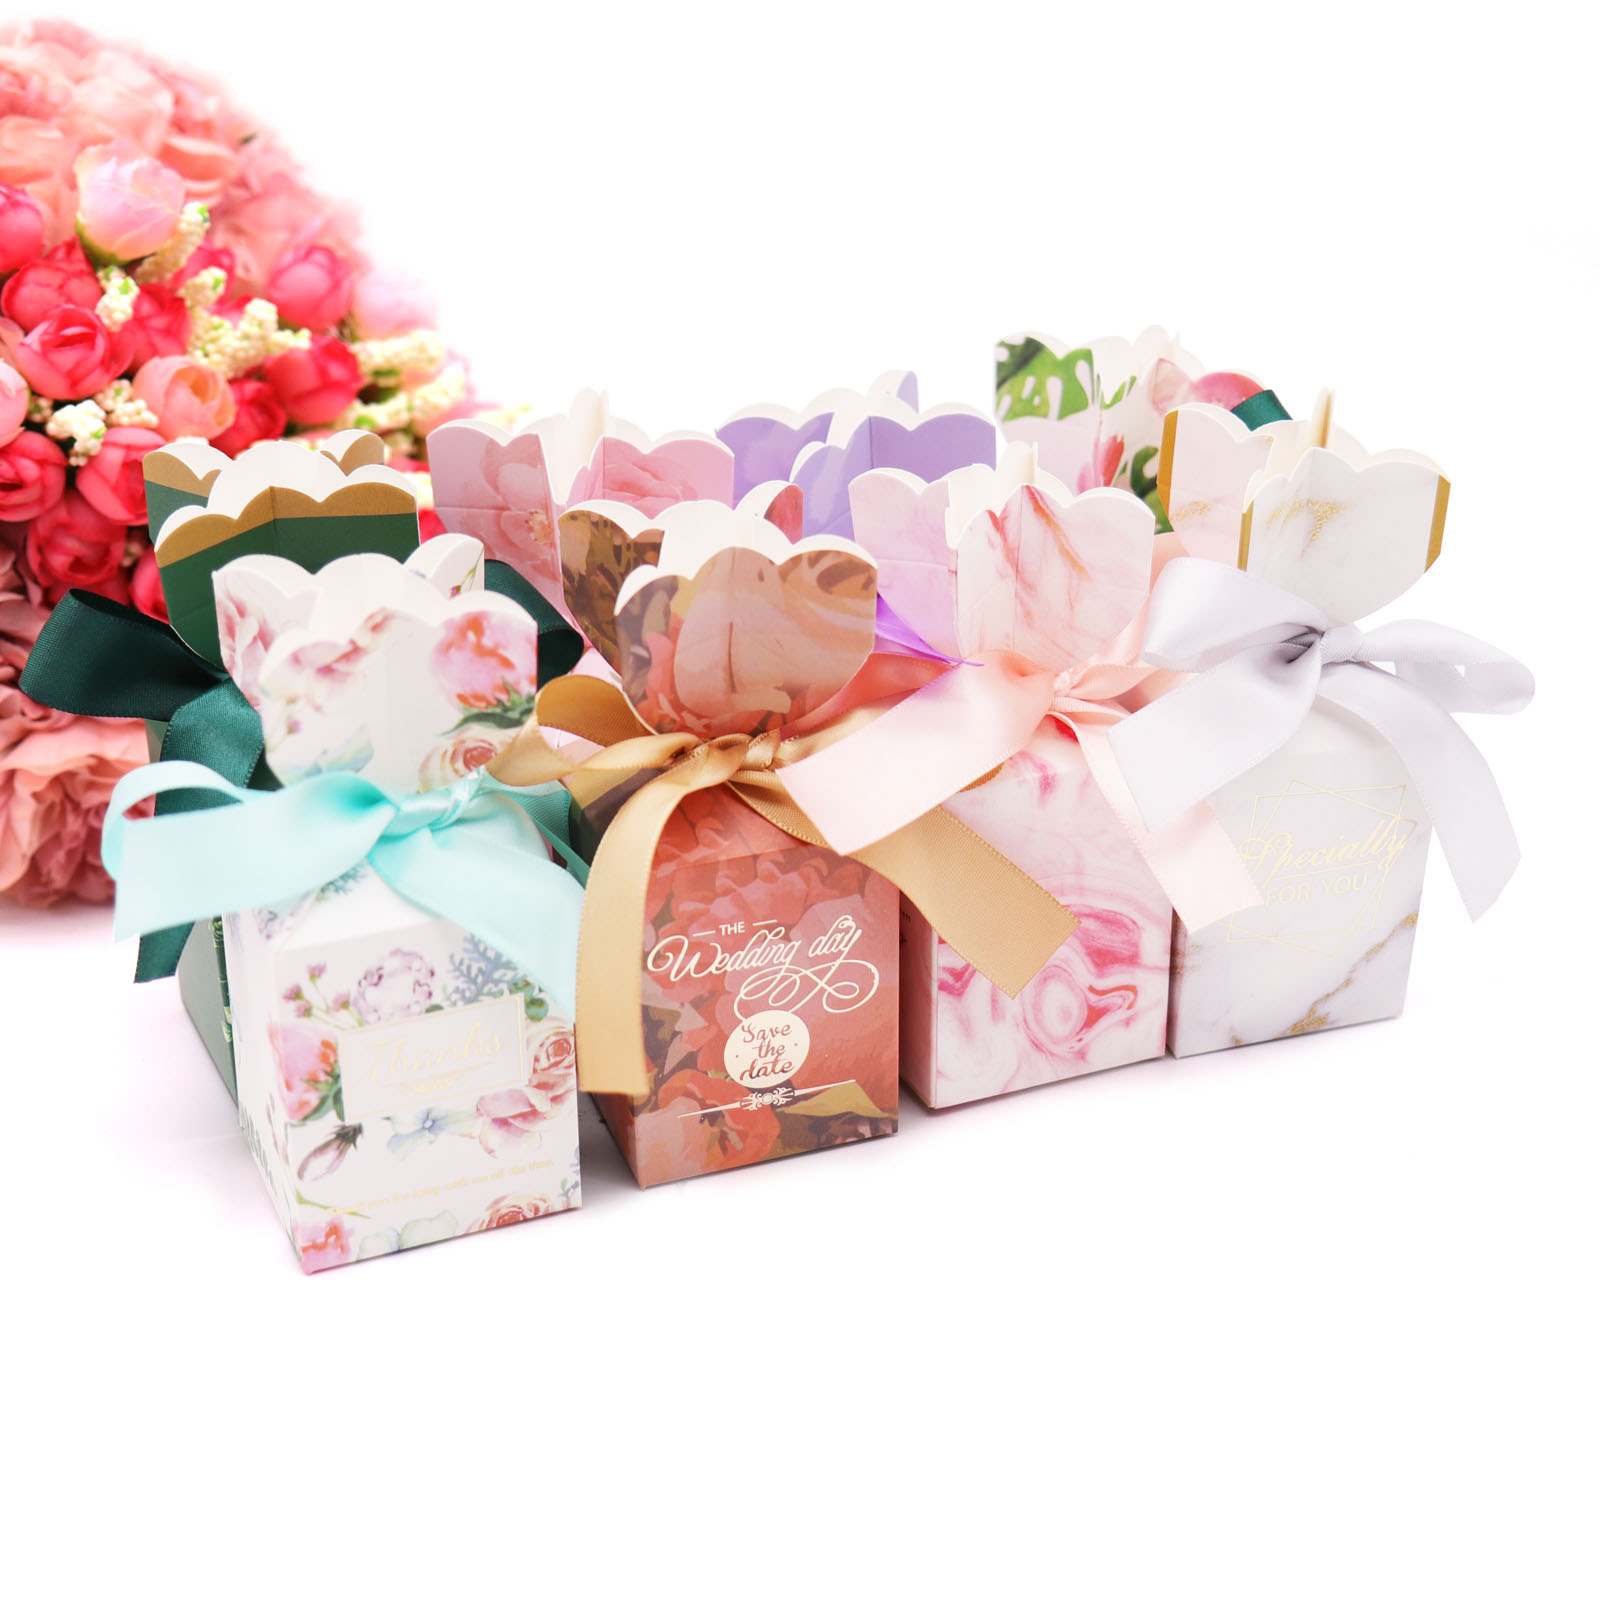 10Pcs Wedding Candy Gift Box Vase Flower Design Paper Bag Birthday Party favor